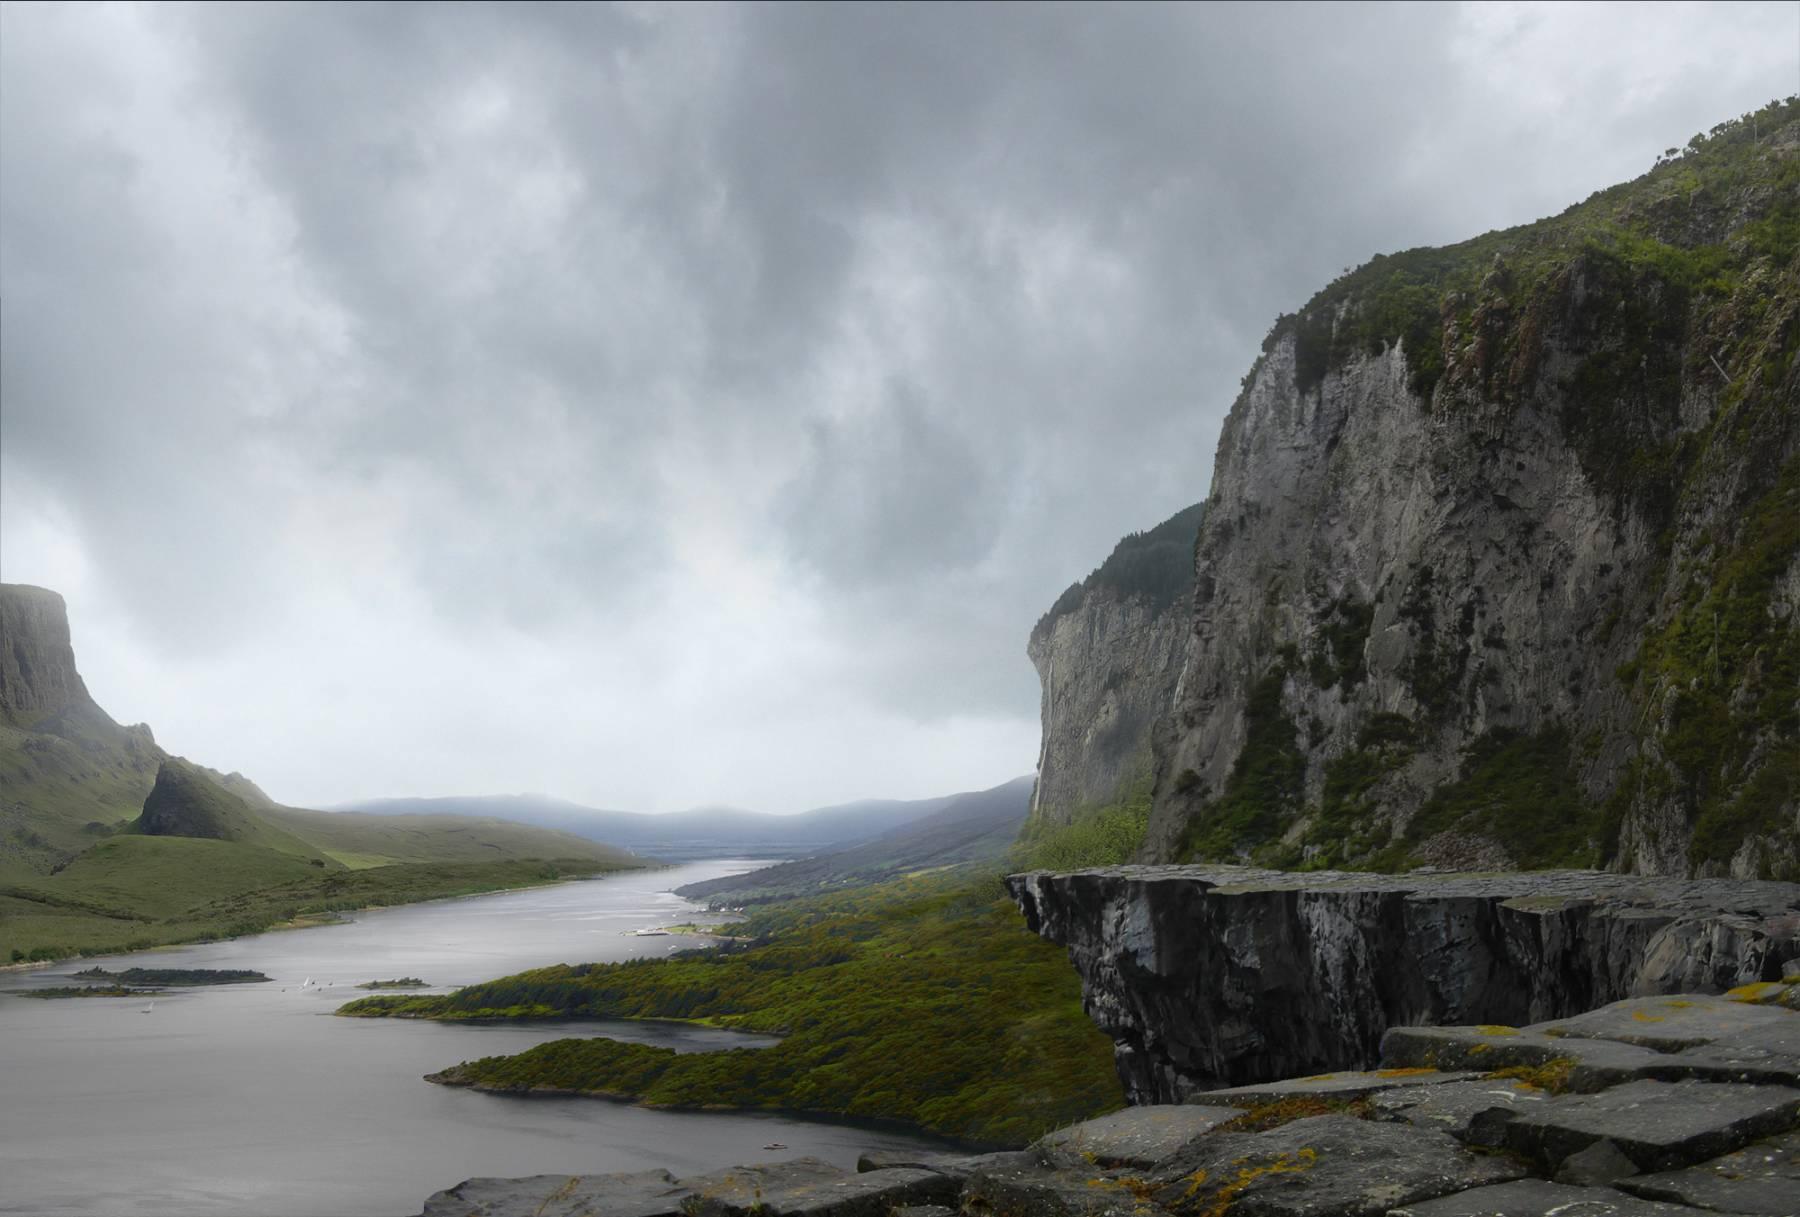 The cliff edge